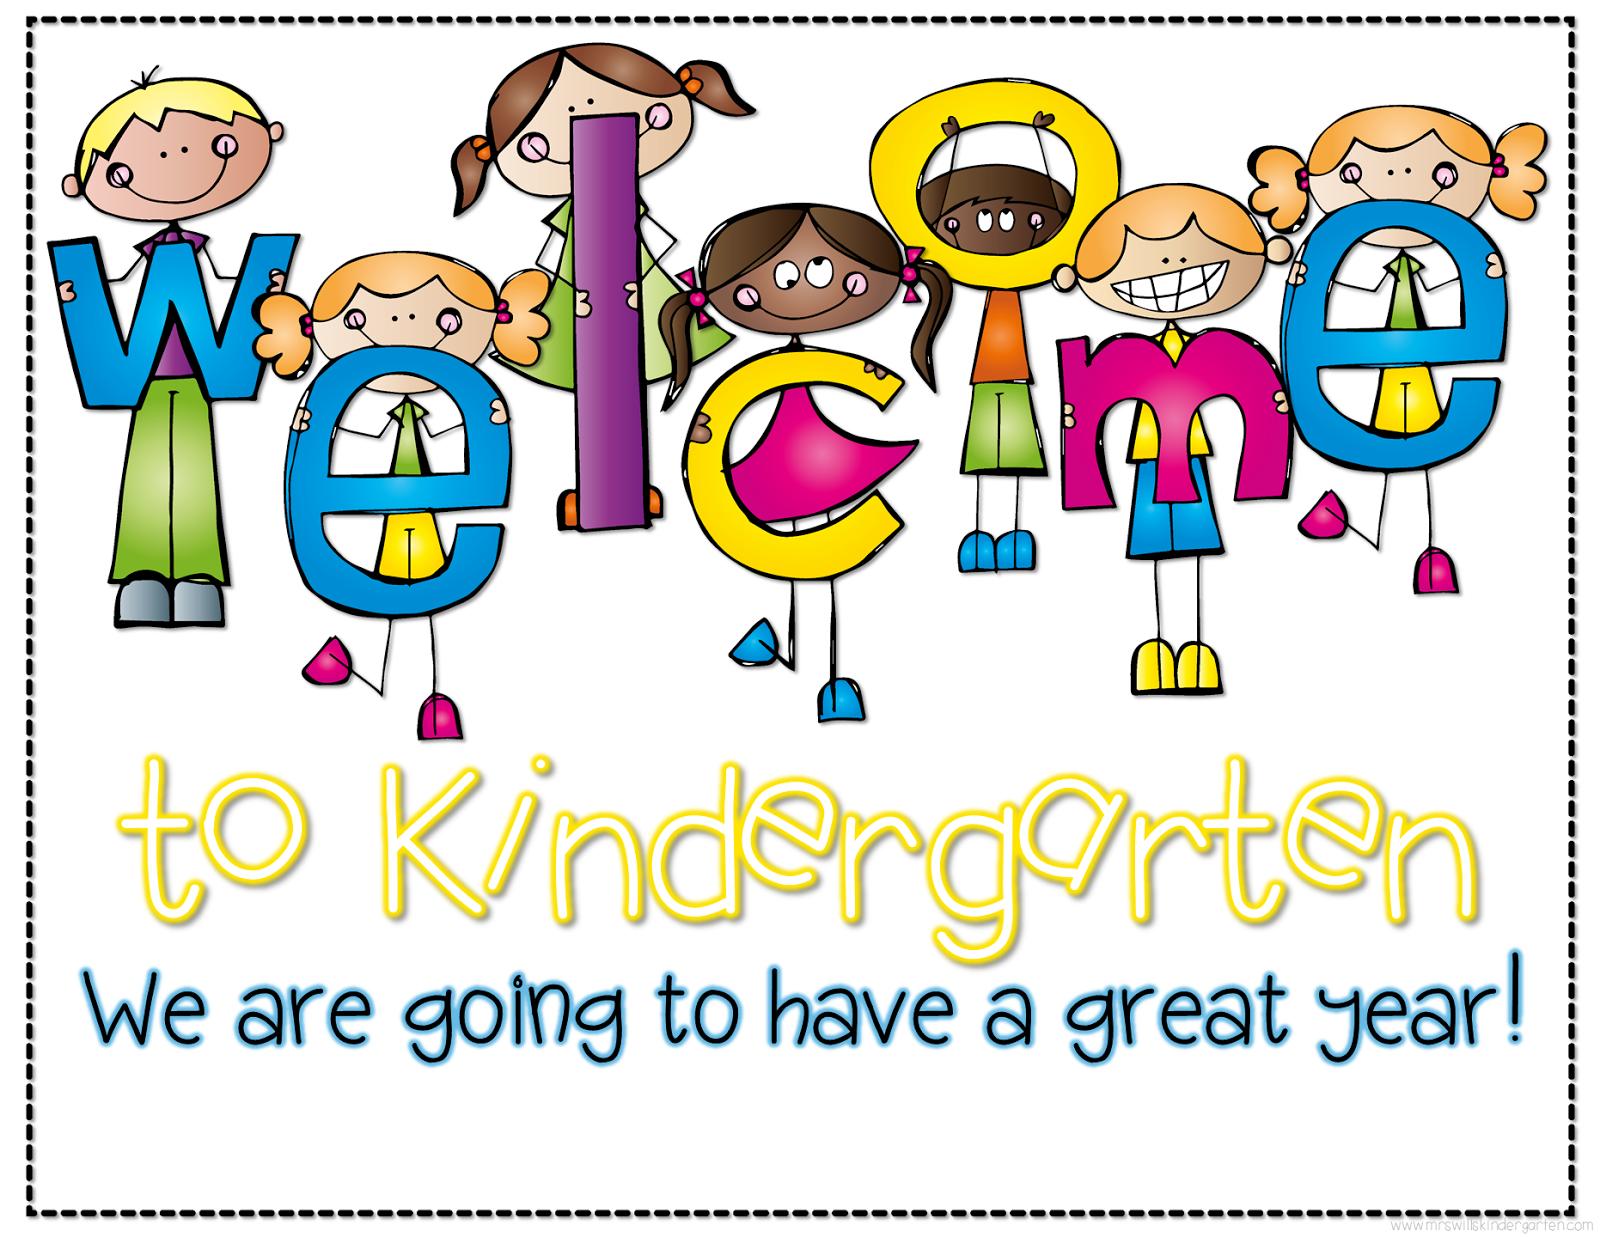 Kindergarten orientation clipart clipart royalty free stock Welcome to kindergarten clipart - ClipartFest clipart royalty free stock